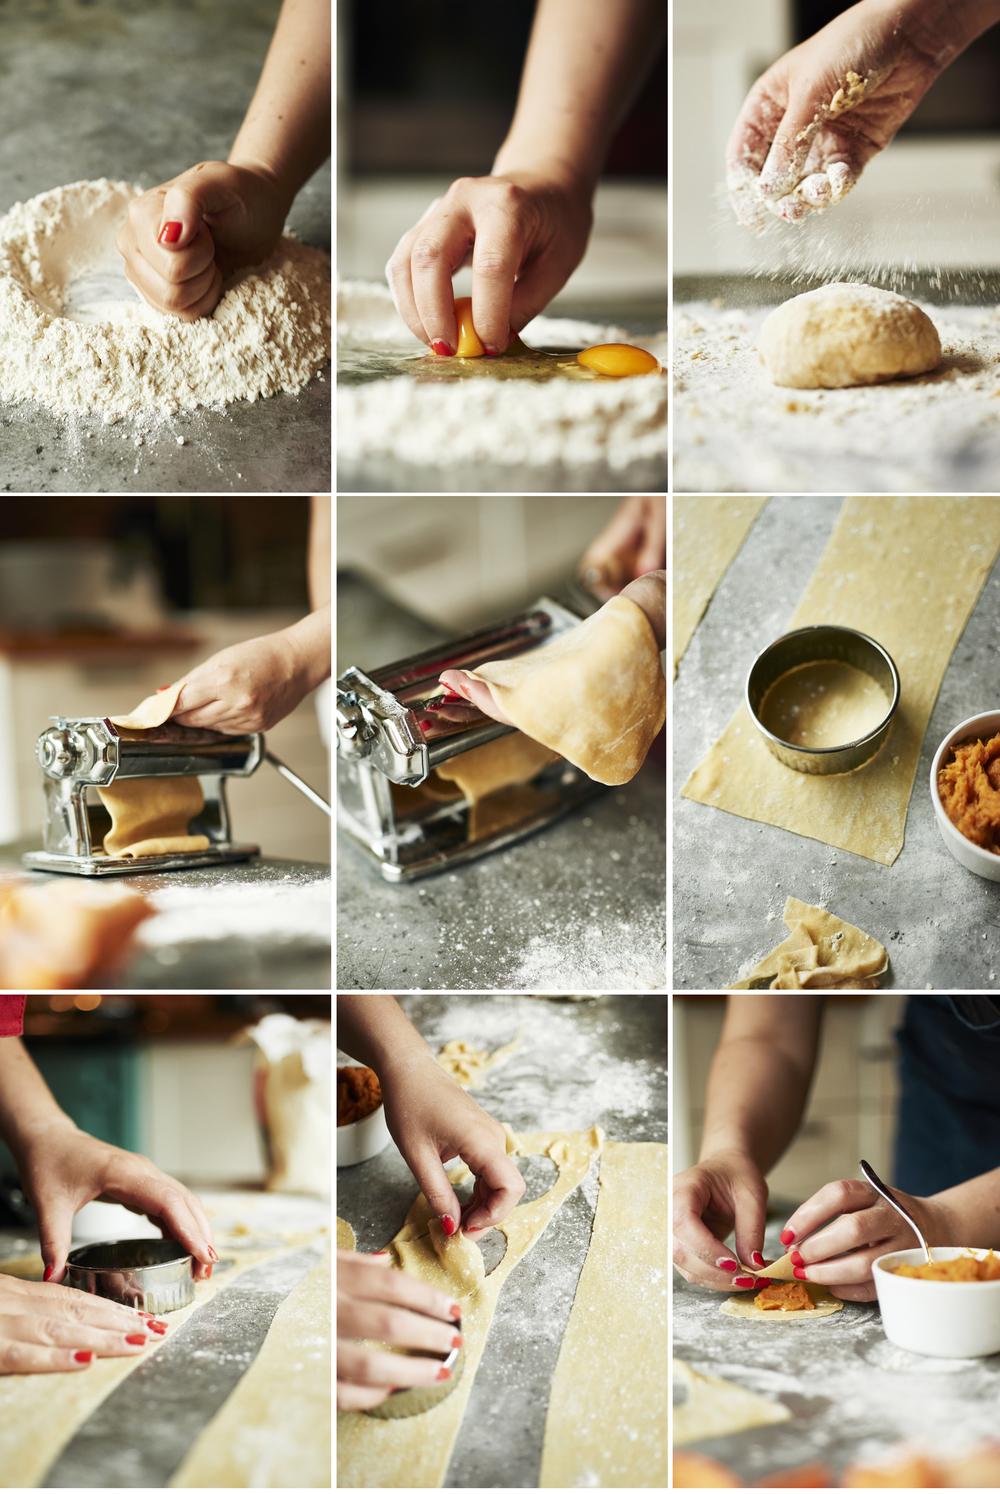 Italy: Making Ravioli